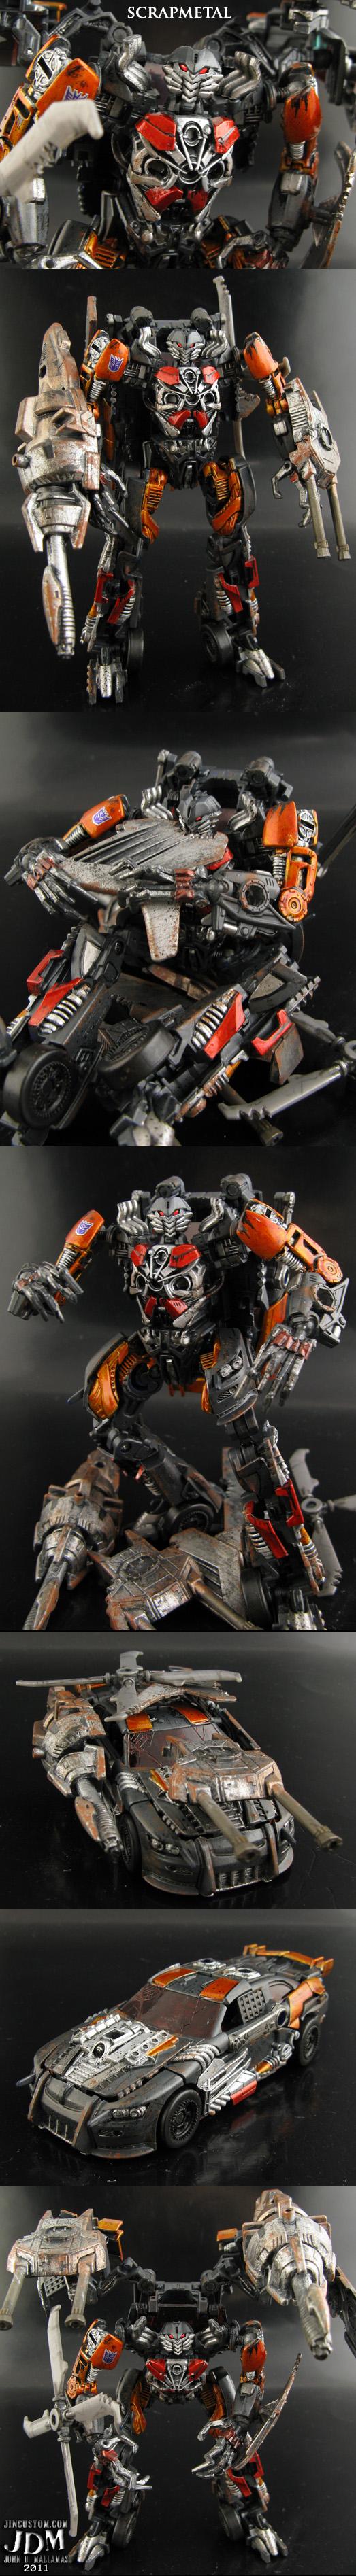 Custom Transformers Scrapmetal by Jin-Saotome